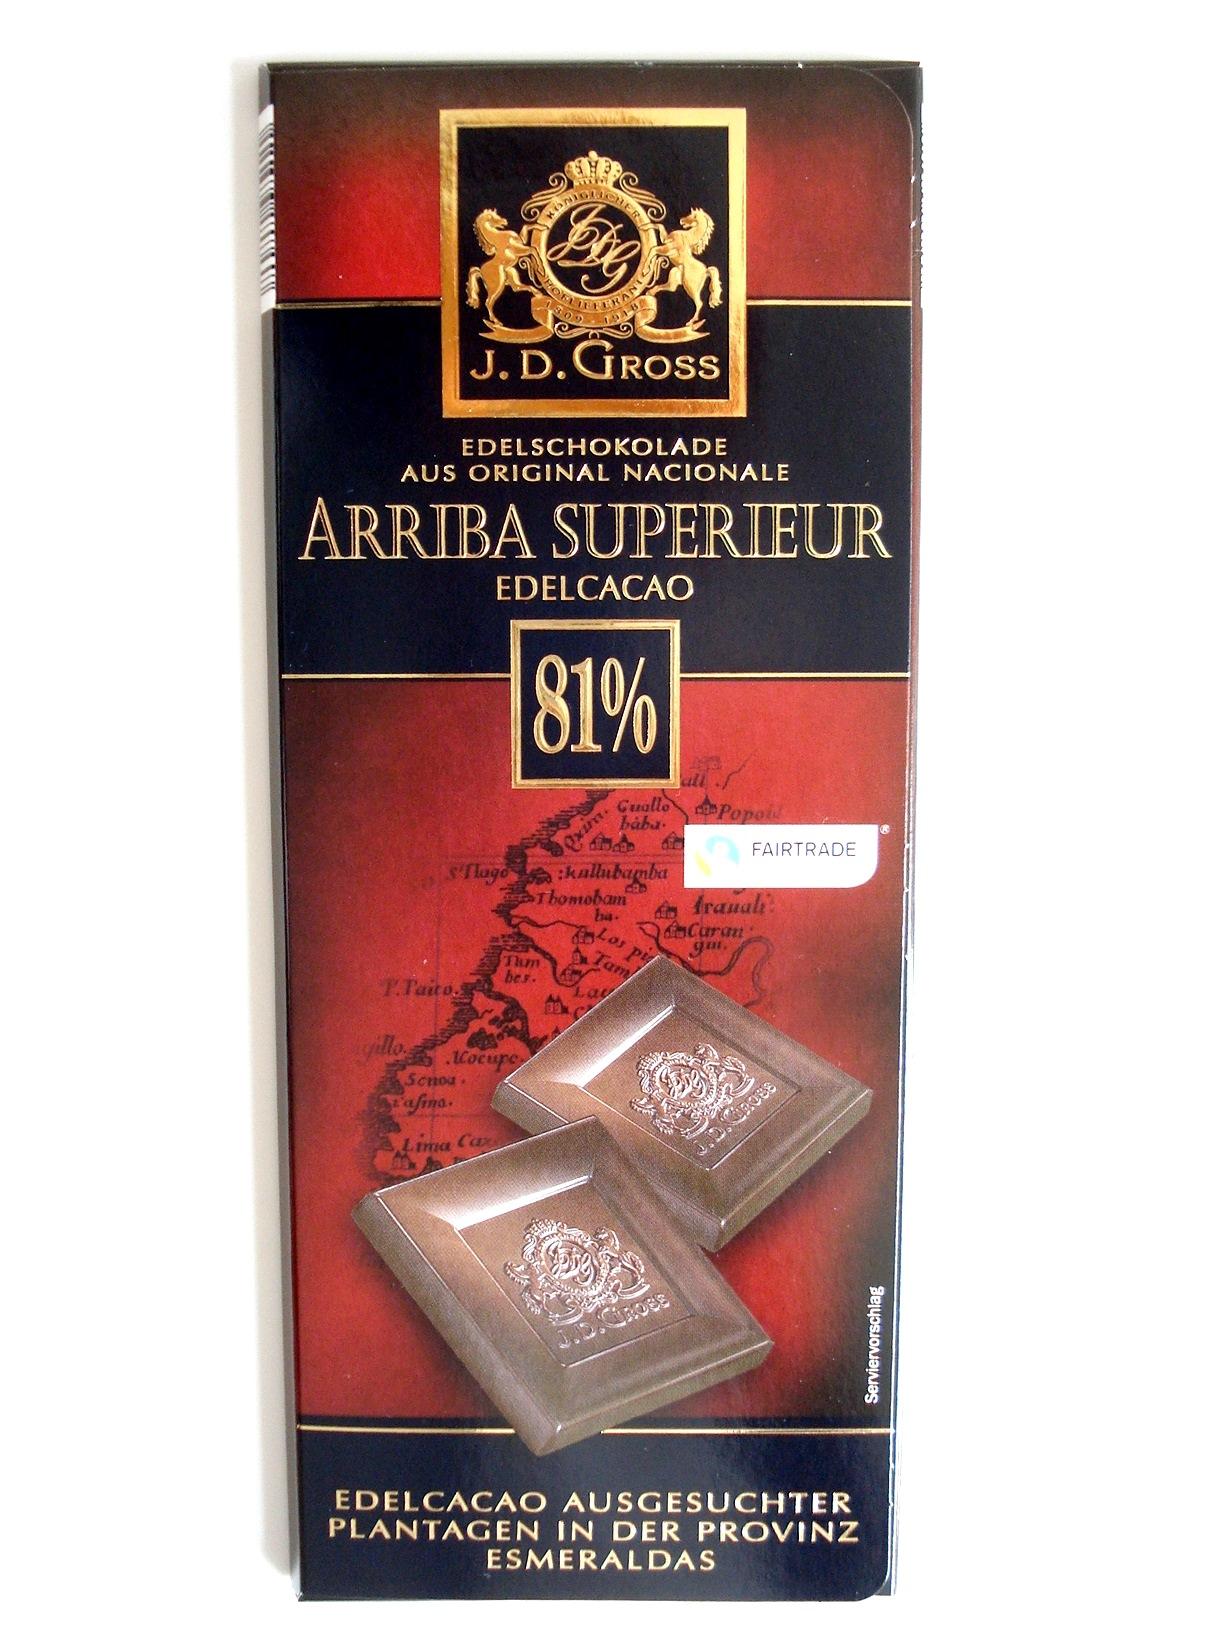 Edel-Schokolade Arriba Superieur 81%